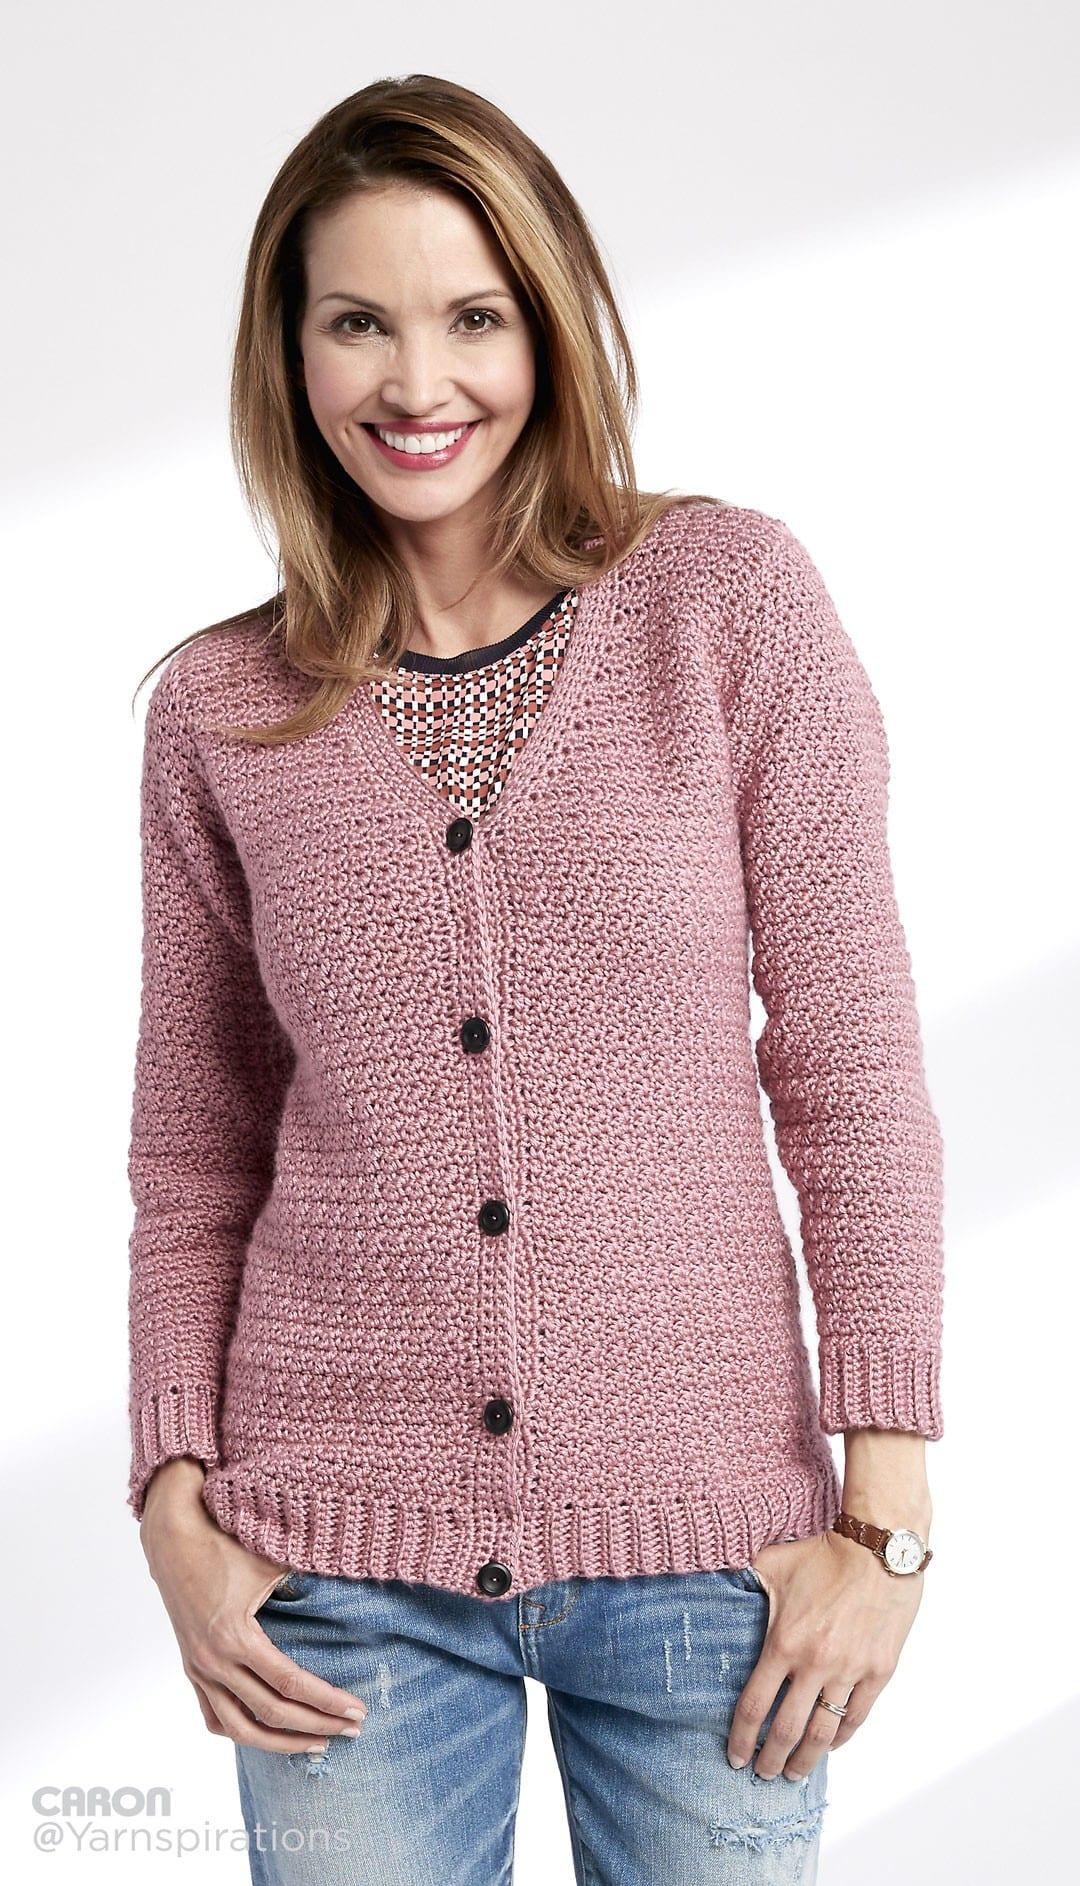 Crochet Sweater Patterns that Look Knit - Sewrella